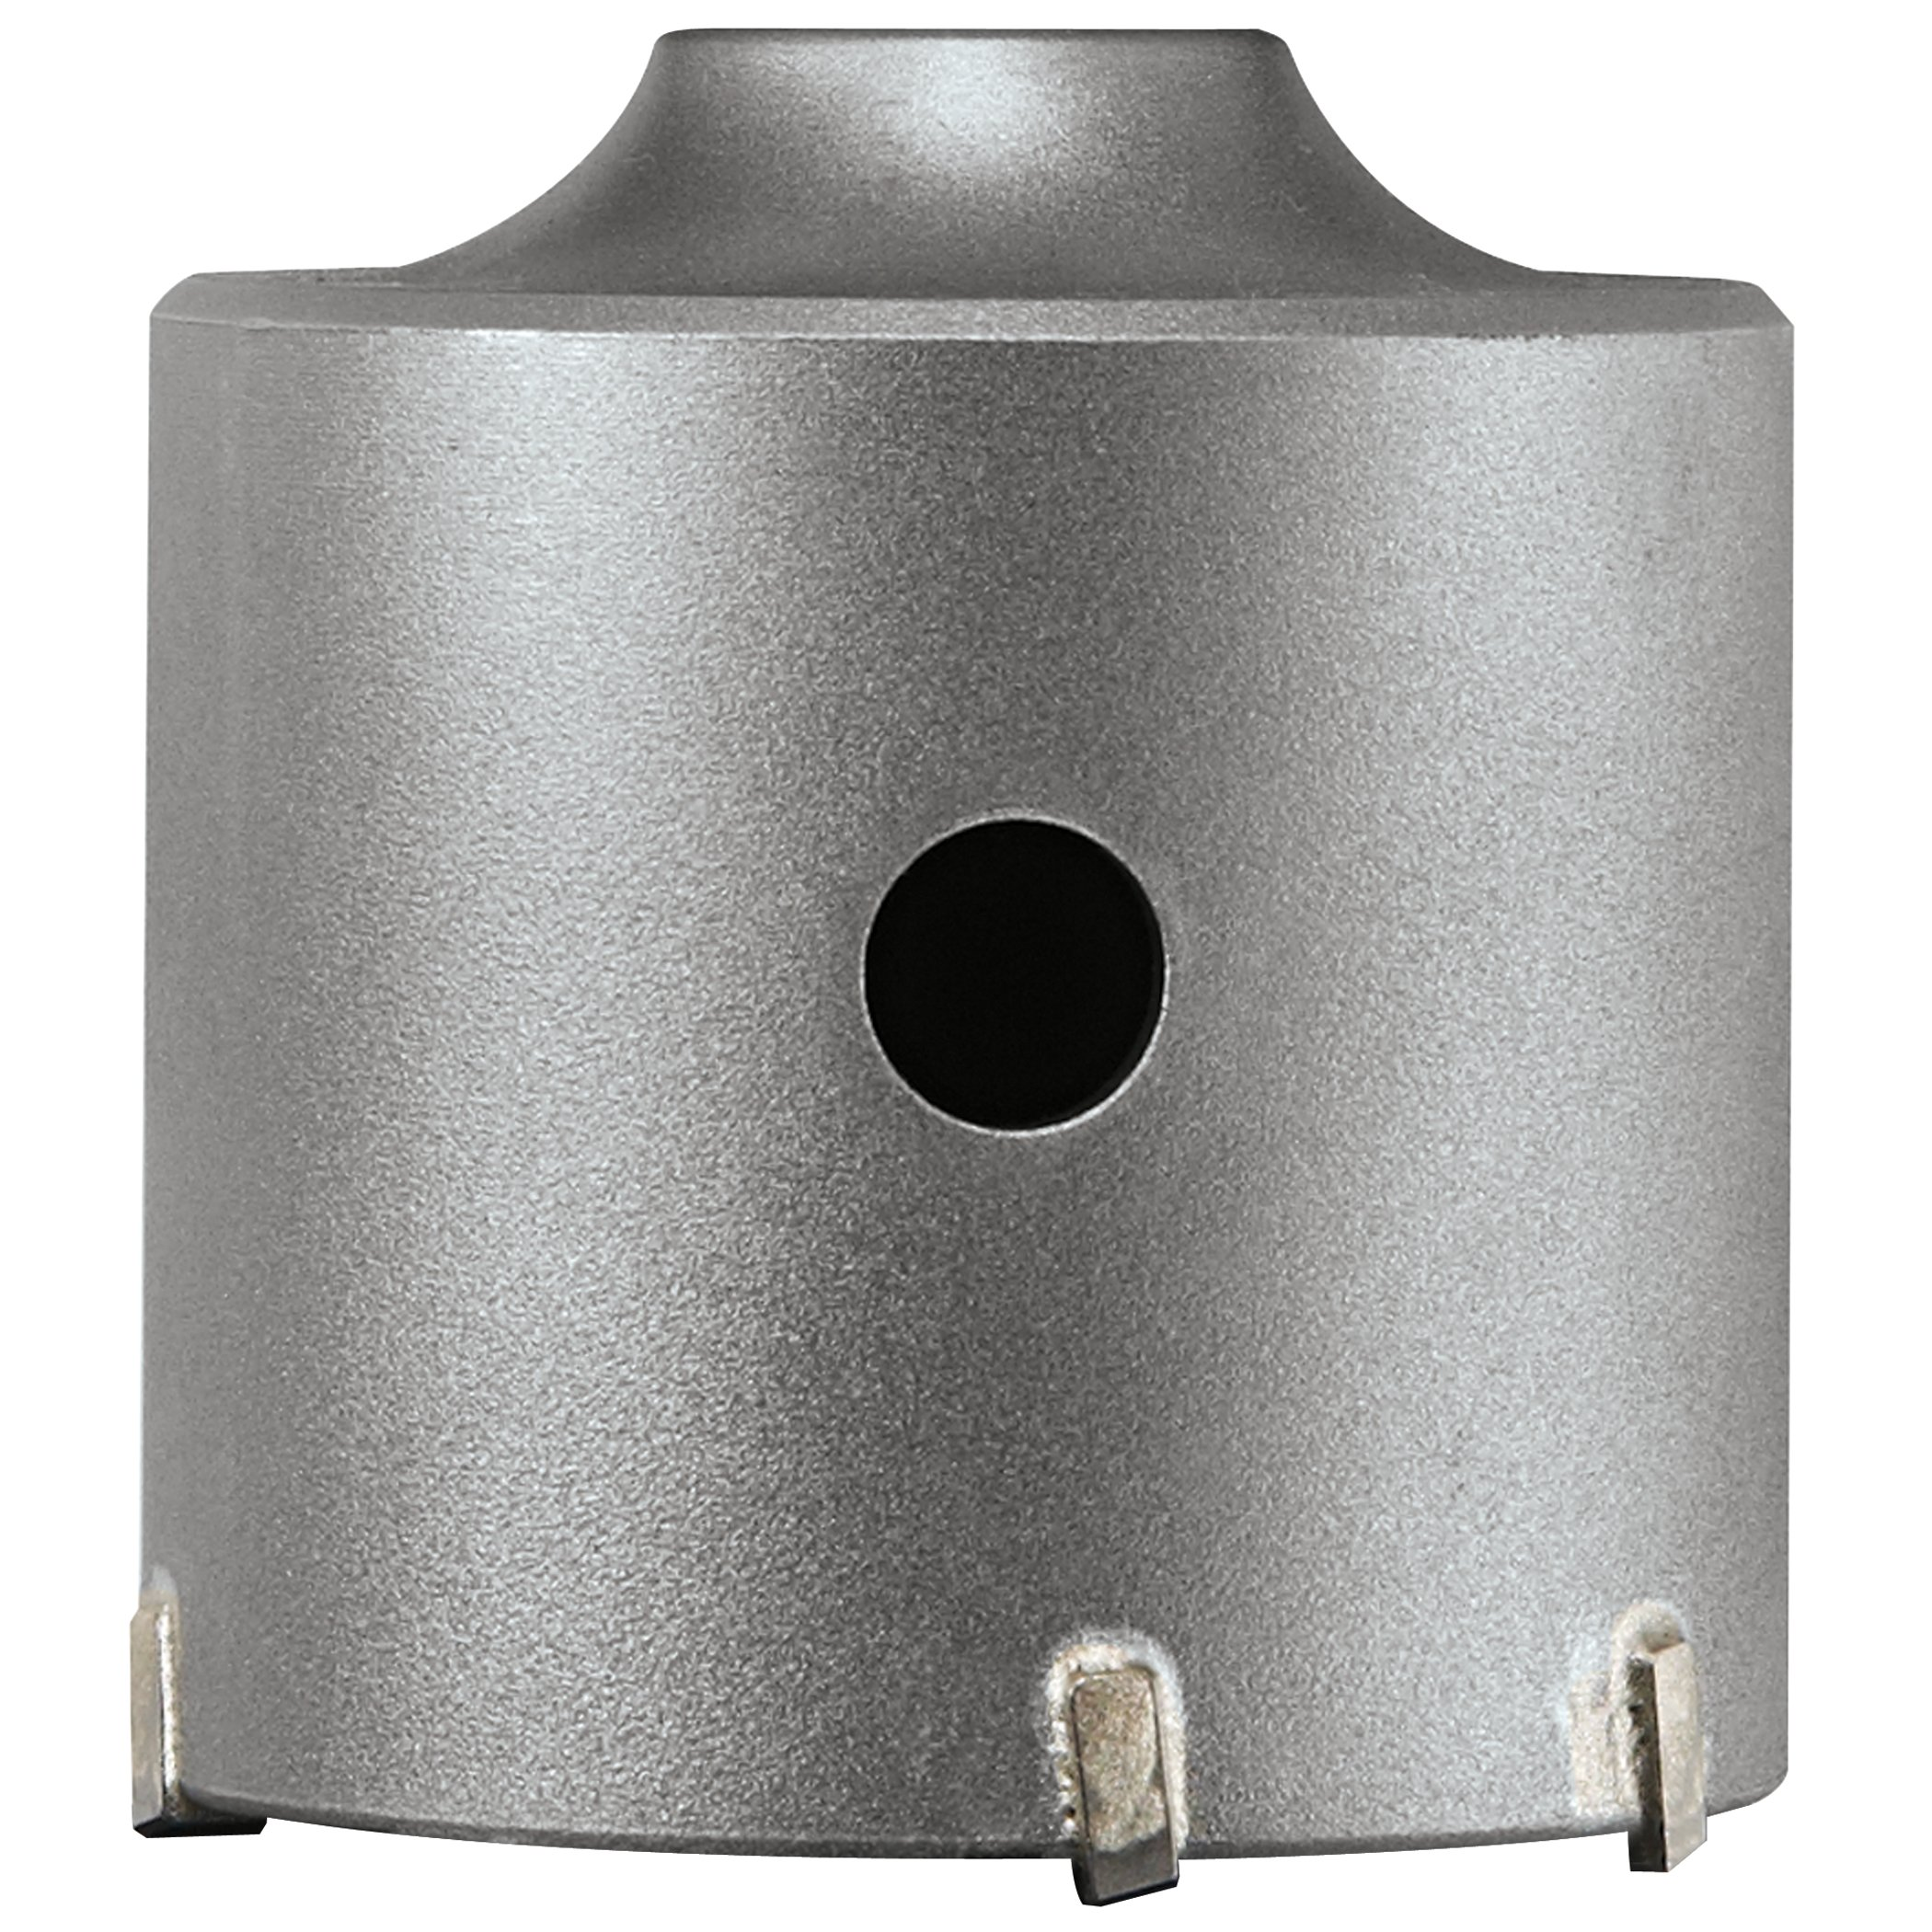 Bosch T3915SC 2-9/16-Inch Sds-Plus Speedcore Thin-Wall Rotary Hammer Core Bit